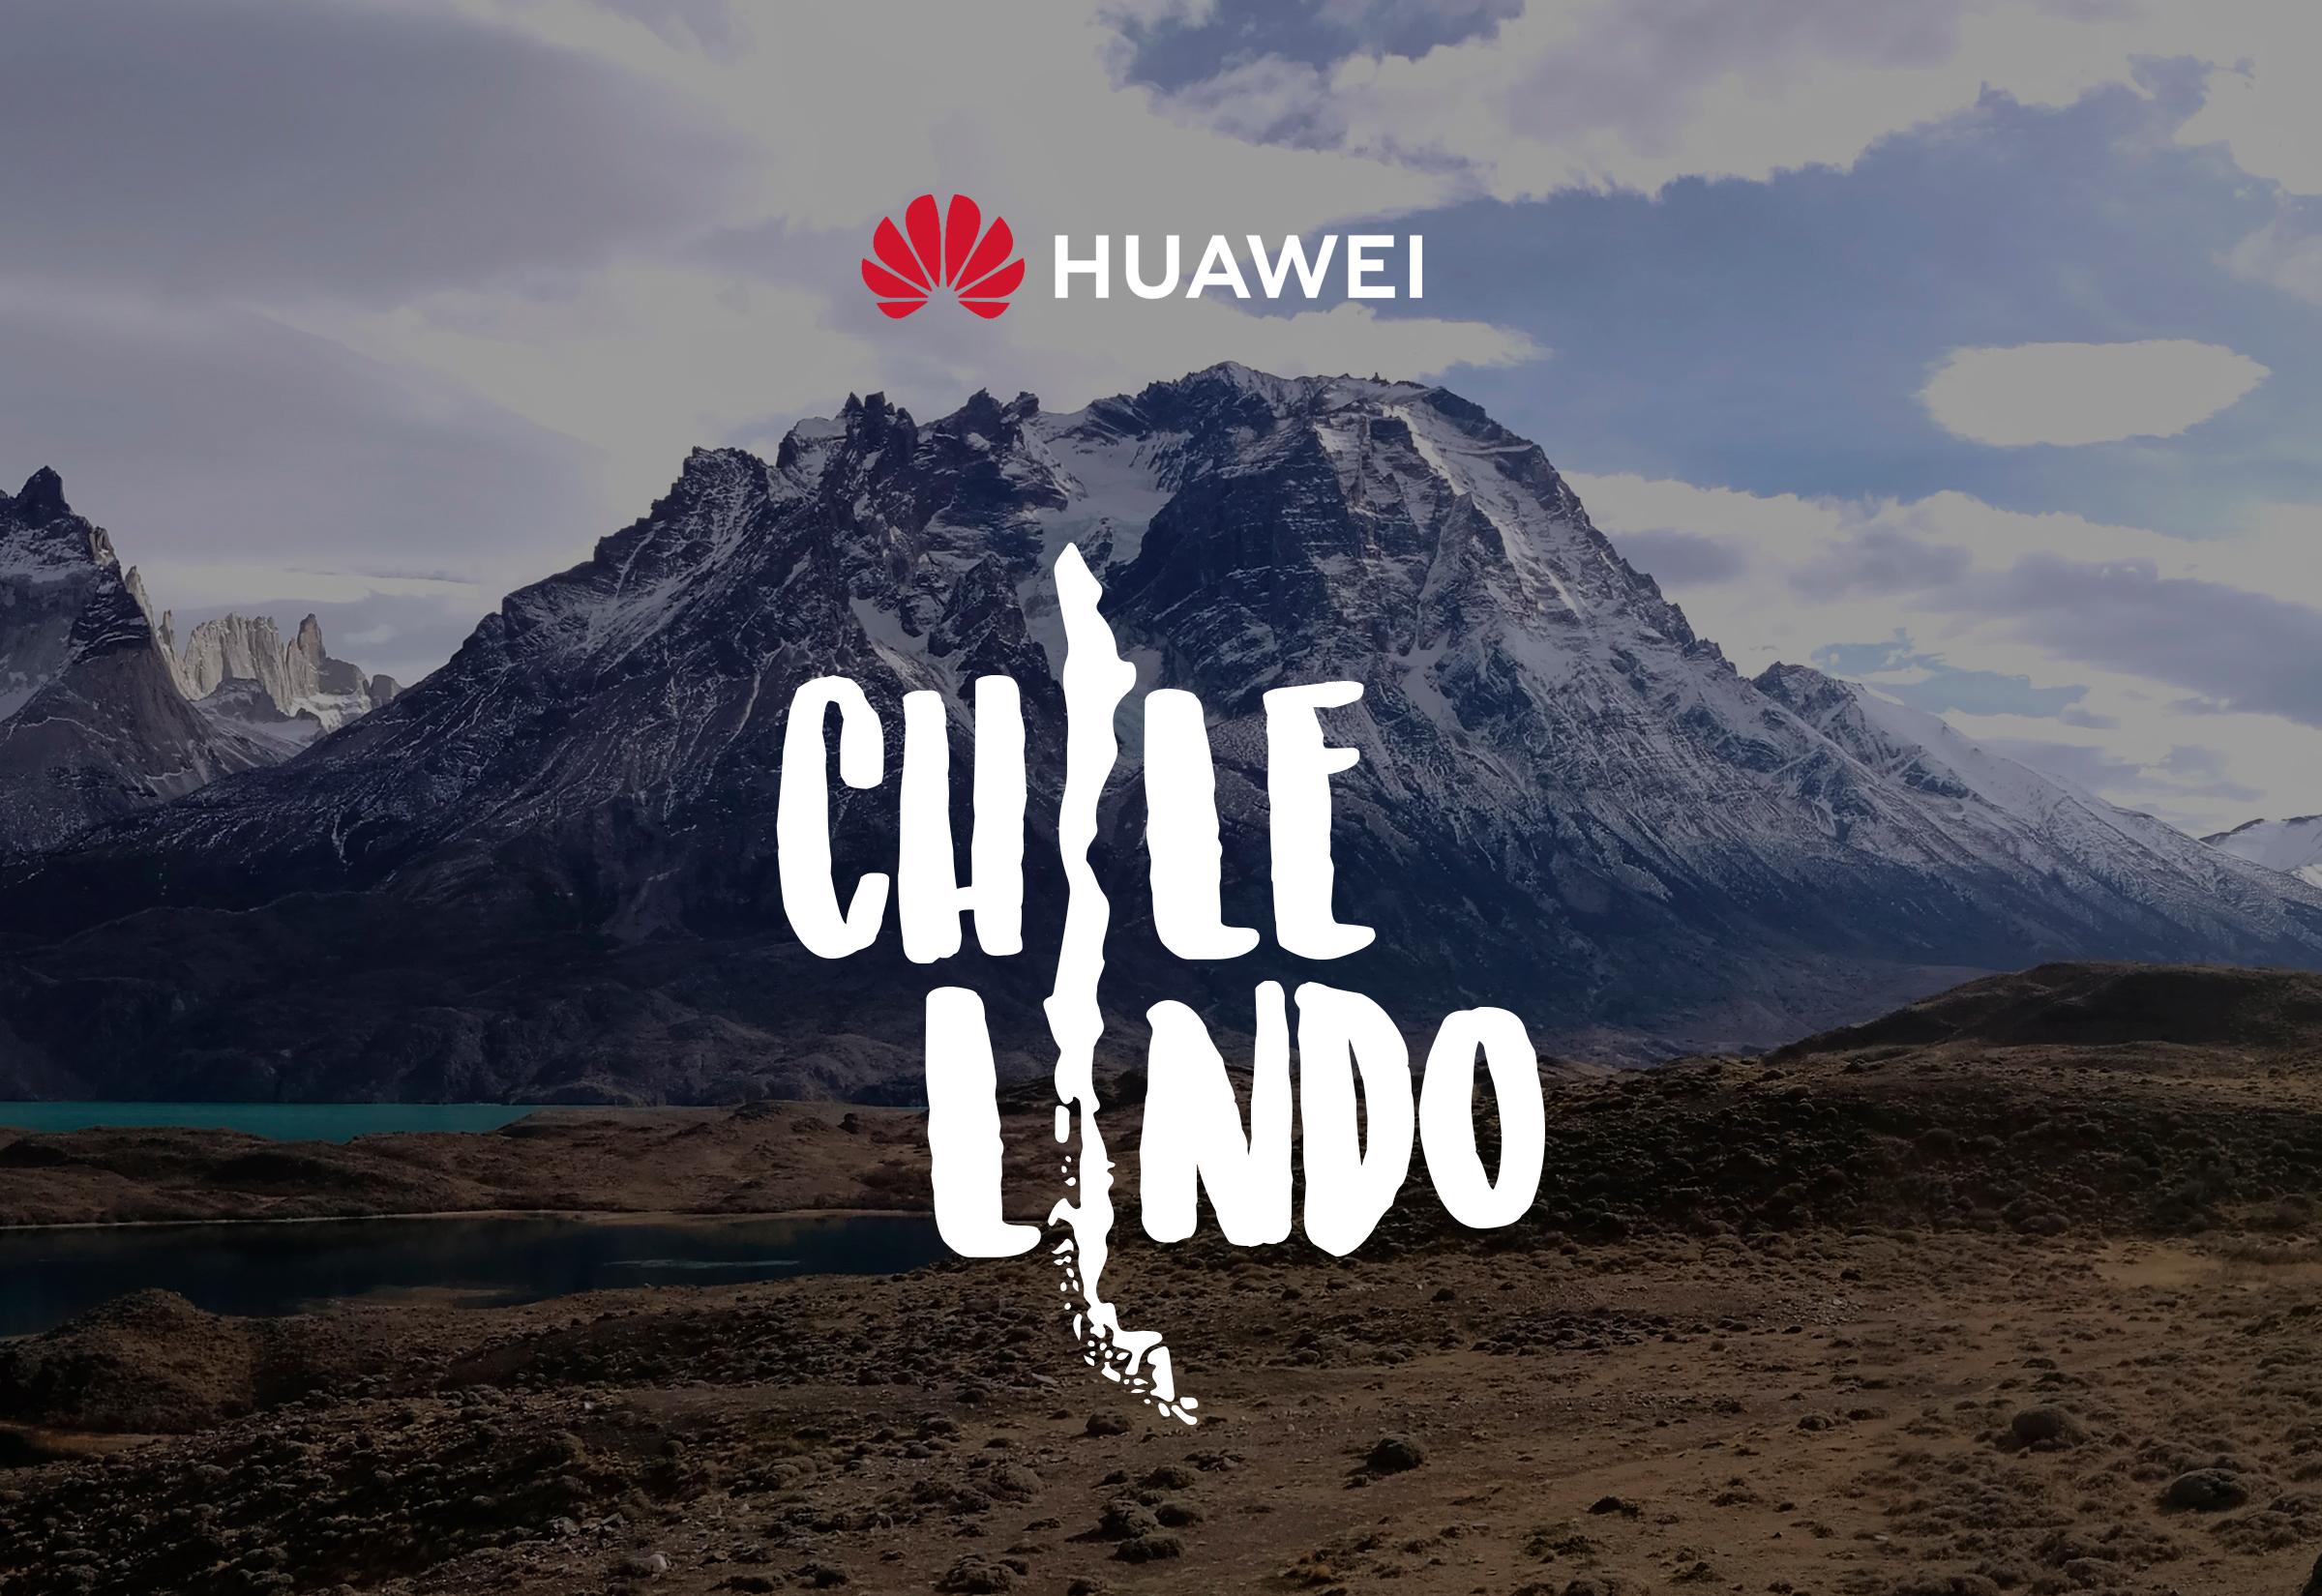 Logo de Huawei Chile Lindo. De fondo, una montaña nevada.